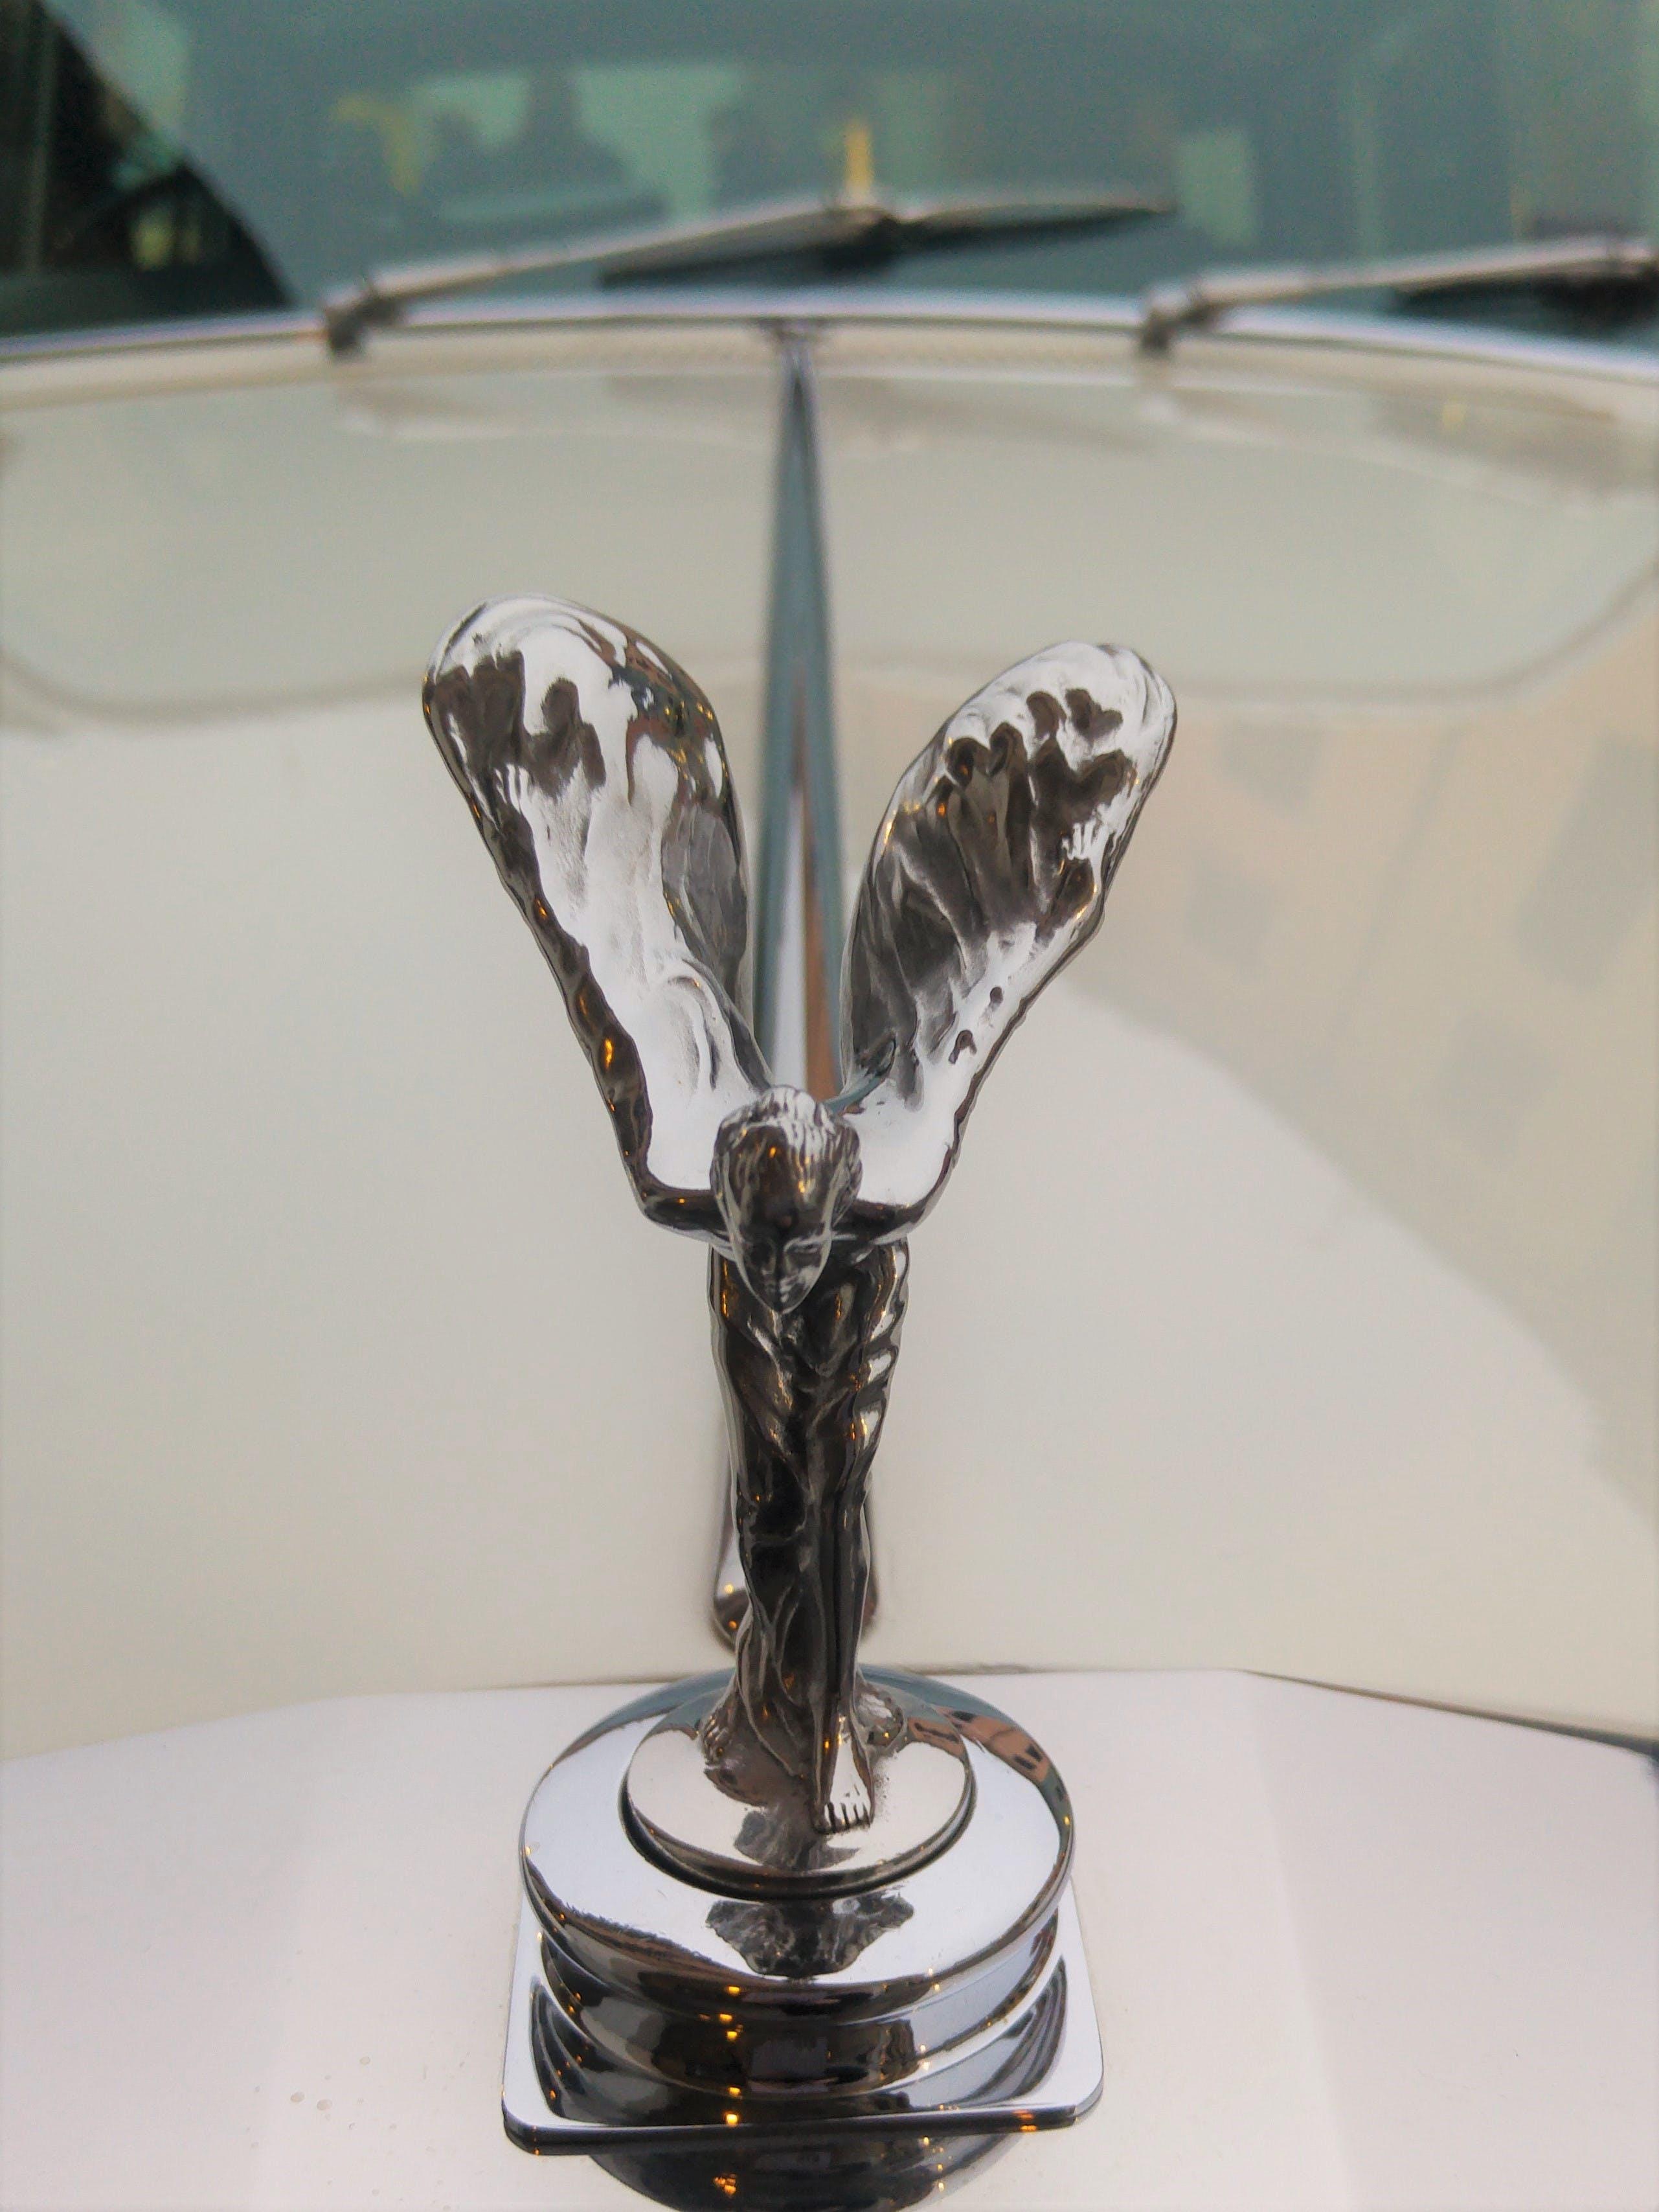 Free stock photo of geometrical, Rolls Royce, vintage car